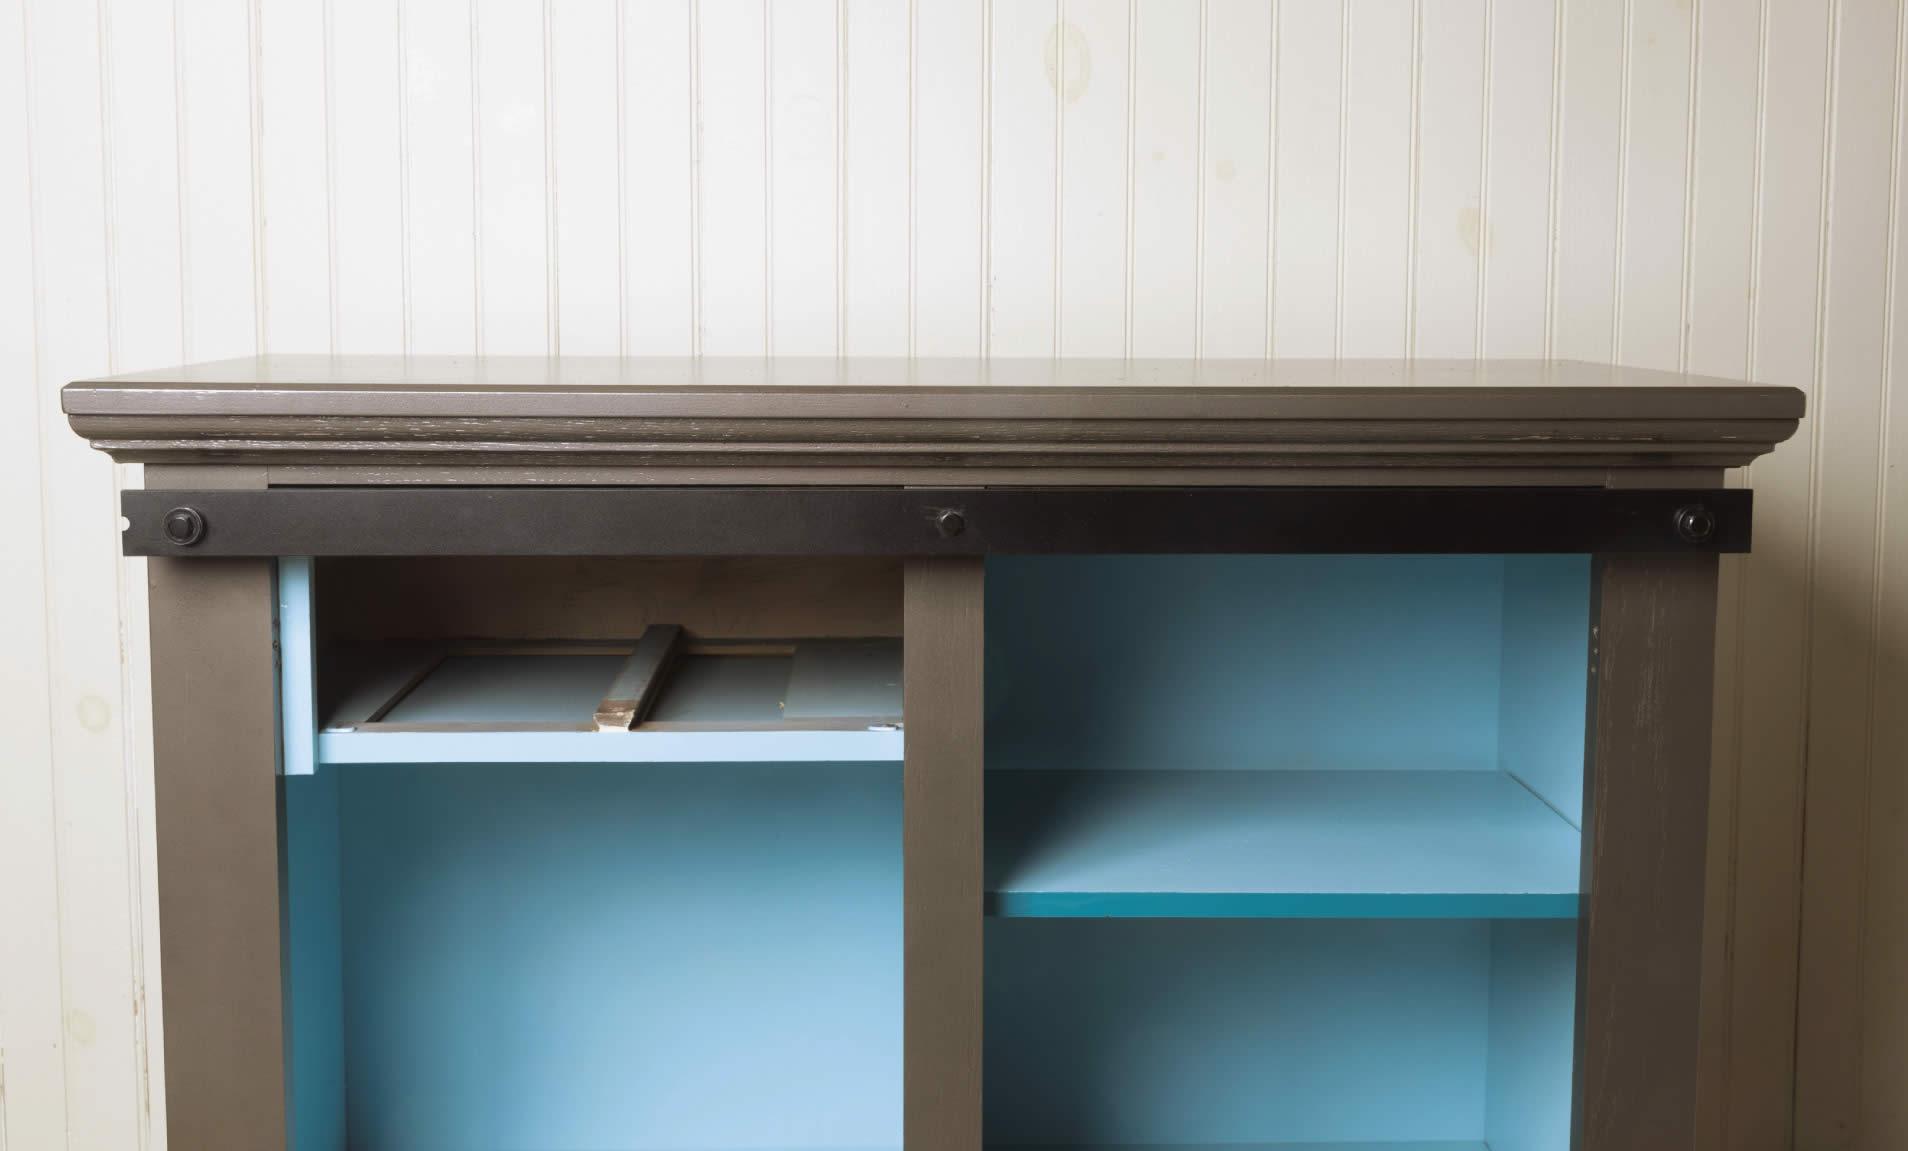 sliding-barn-door-cabinet-arrow-project-step3g.jpg